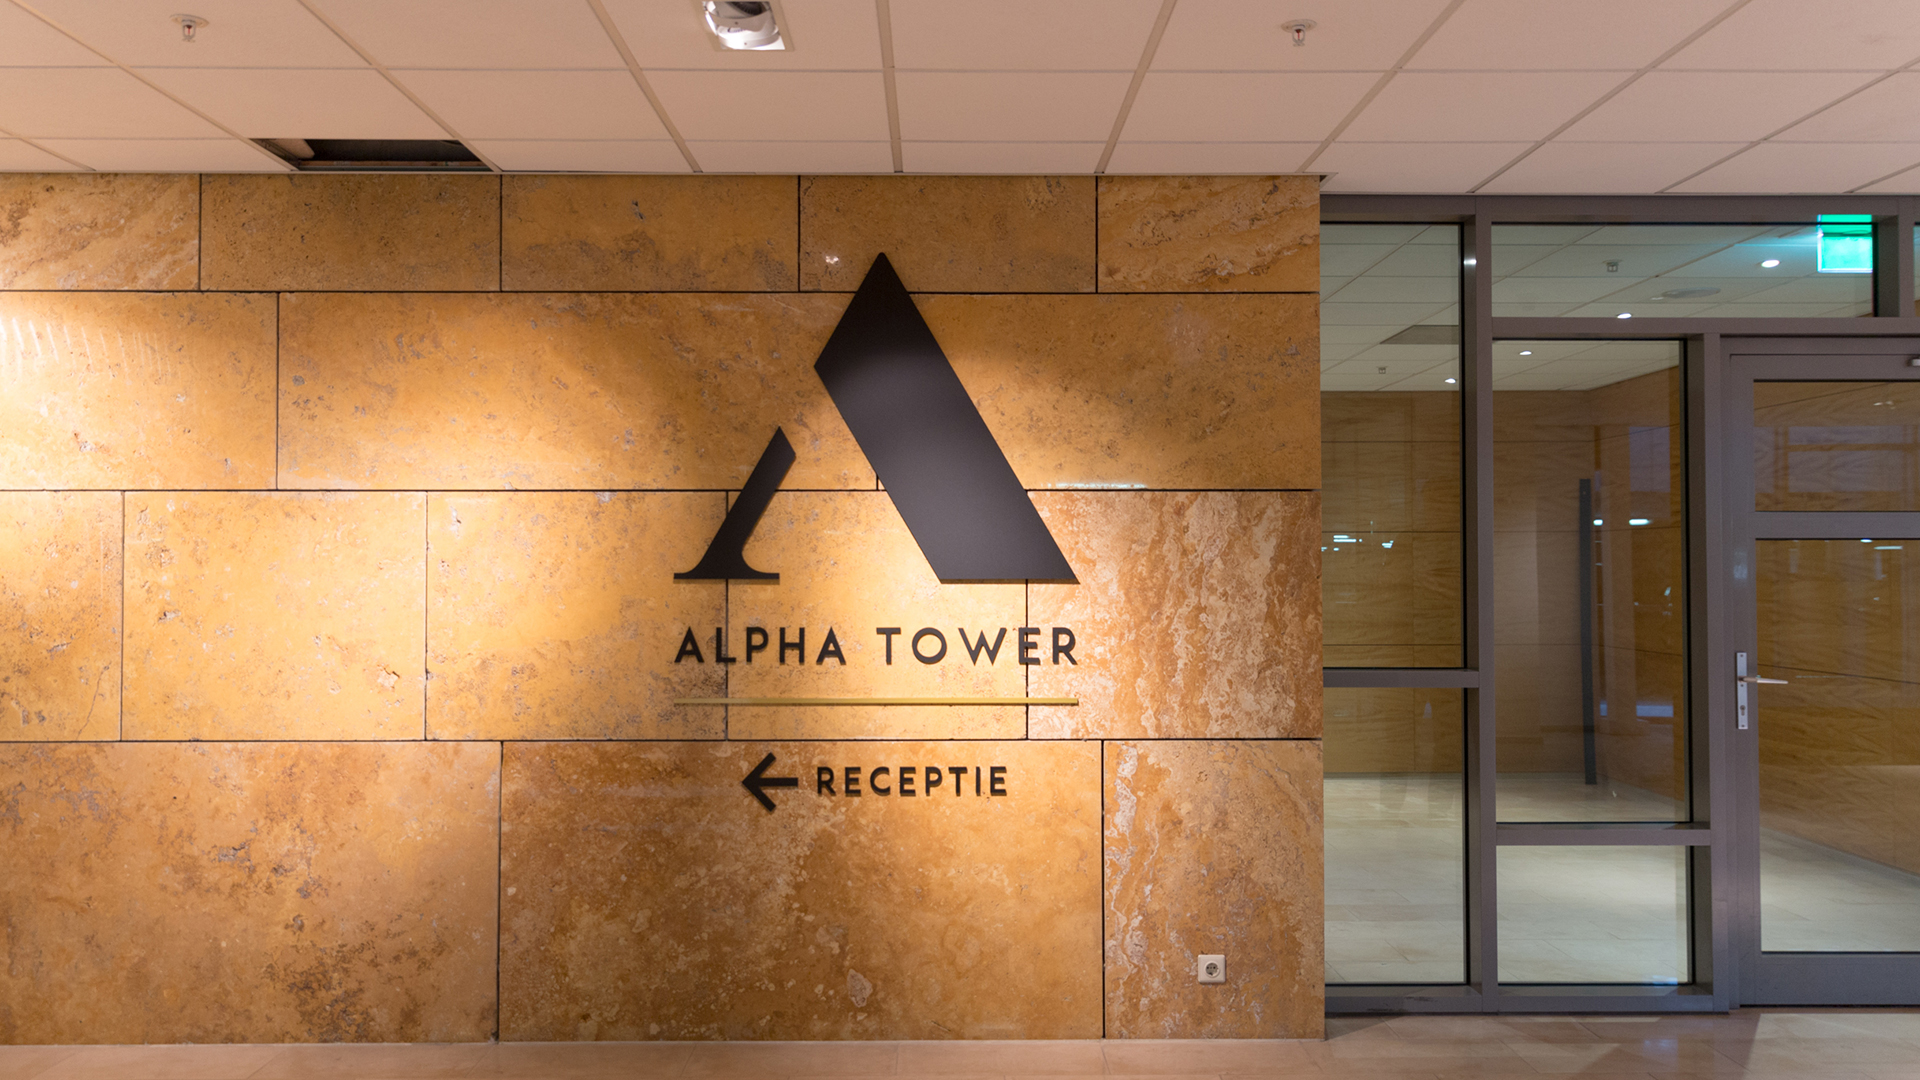 Alpha Tower afbeelding 2.jpg